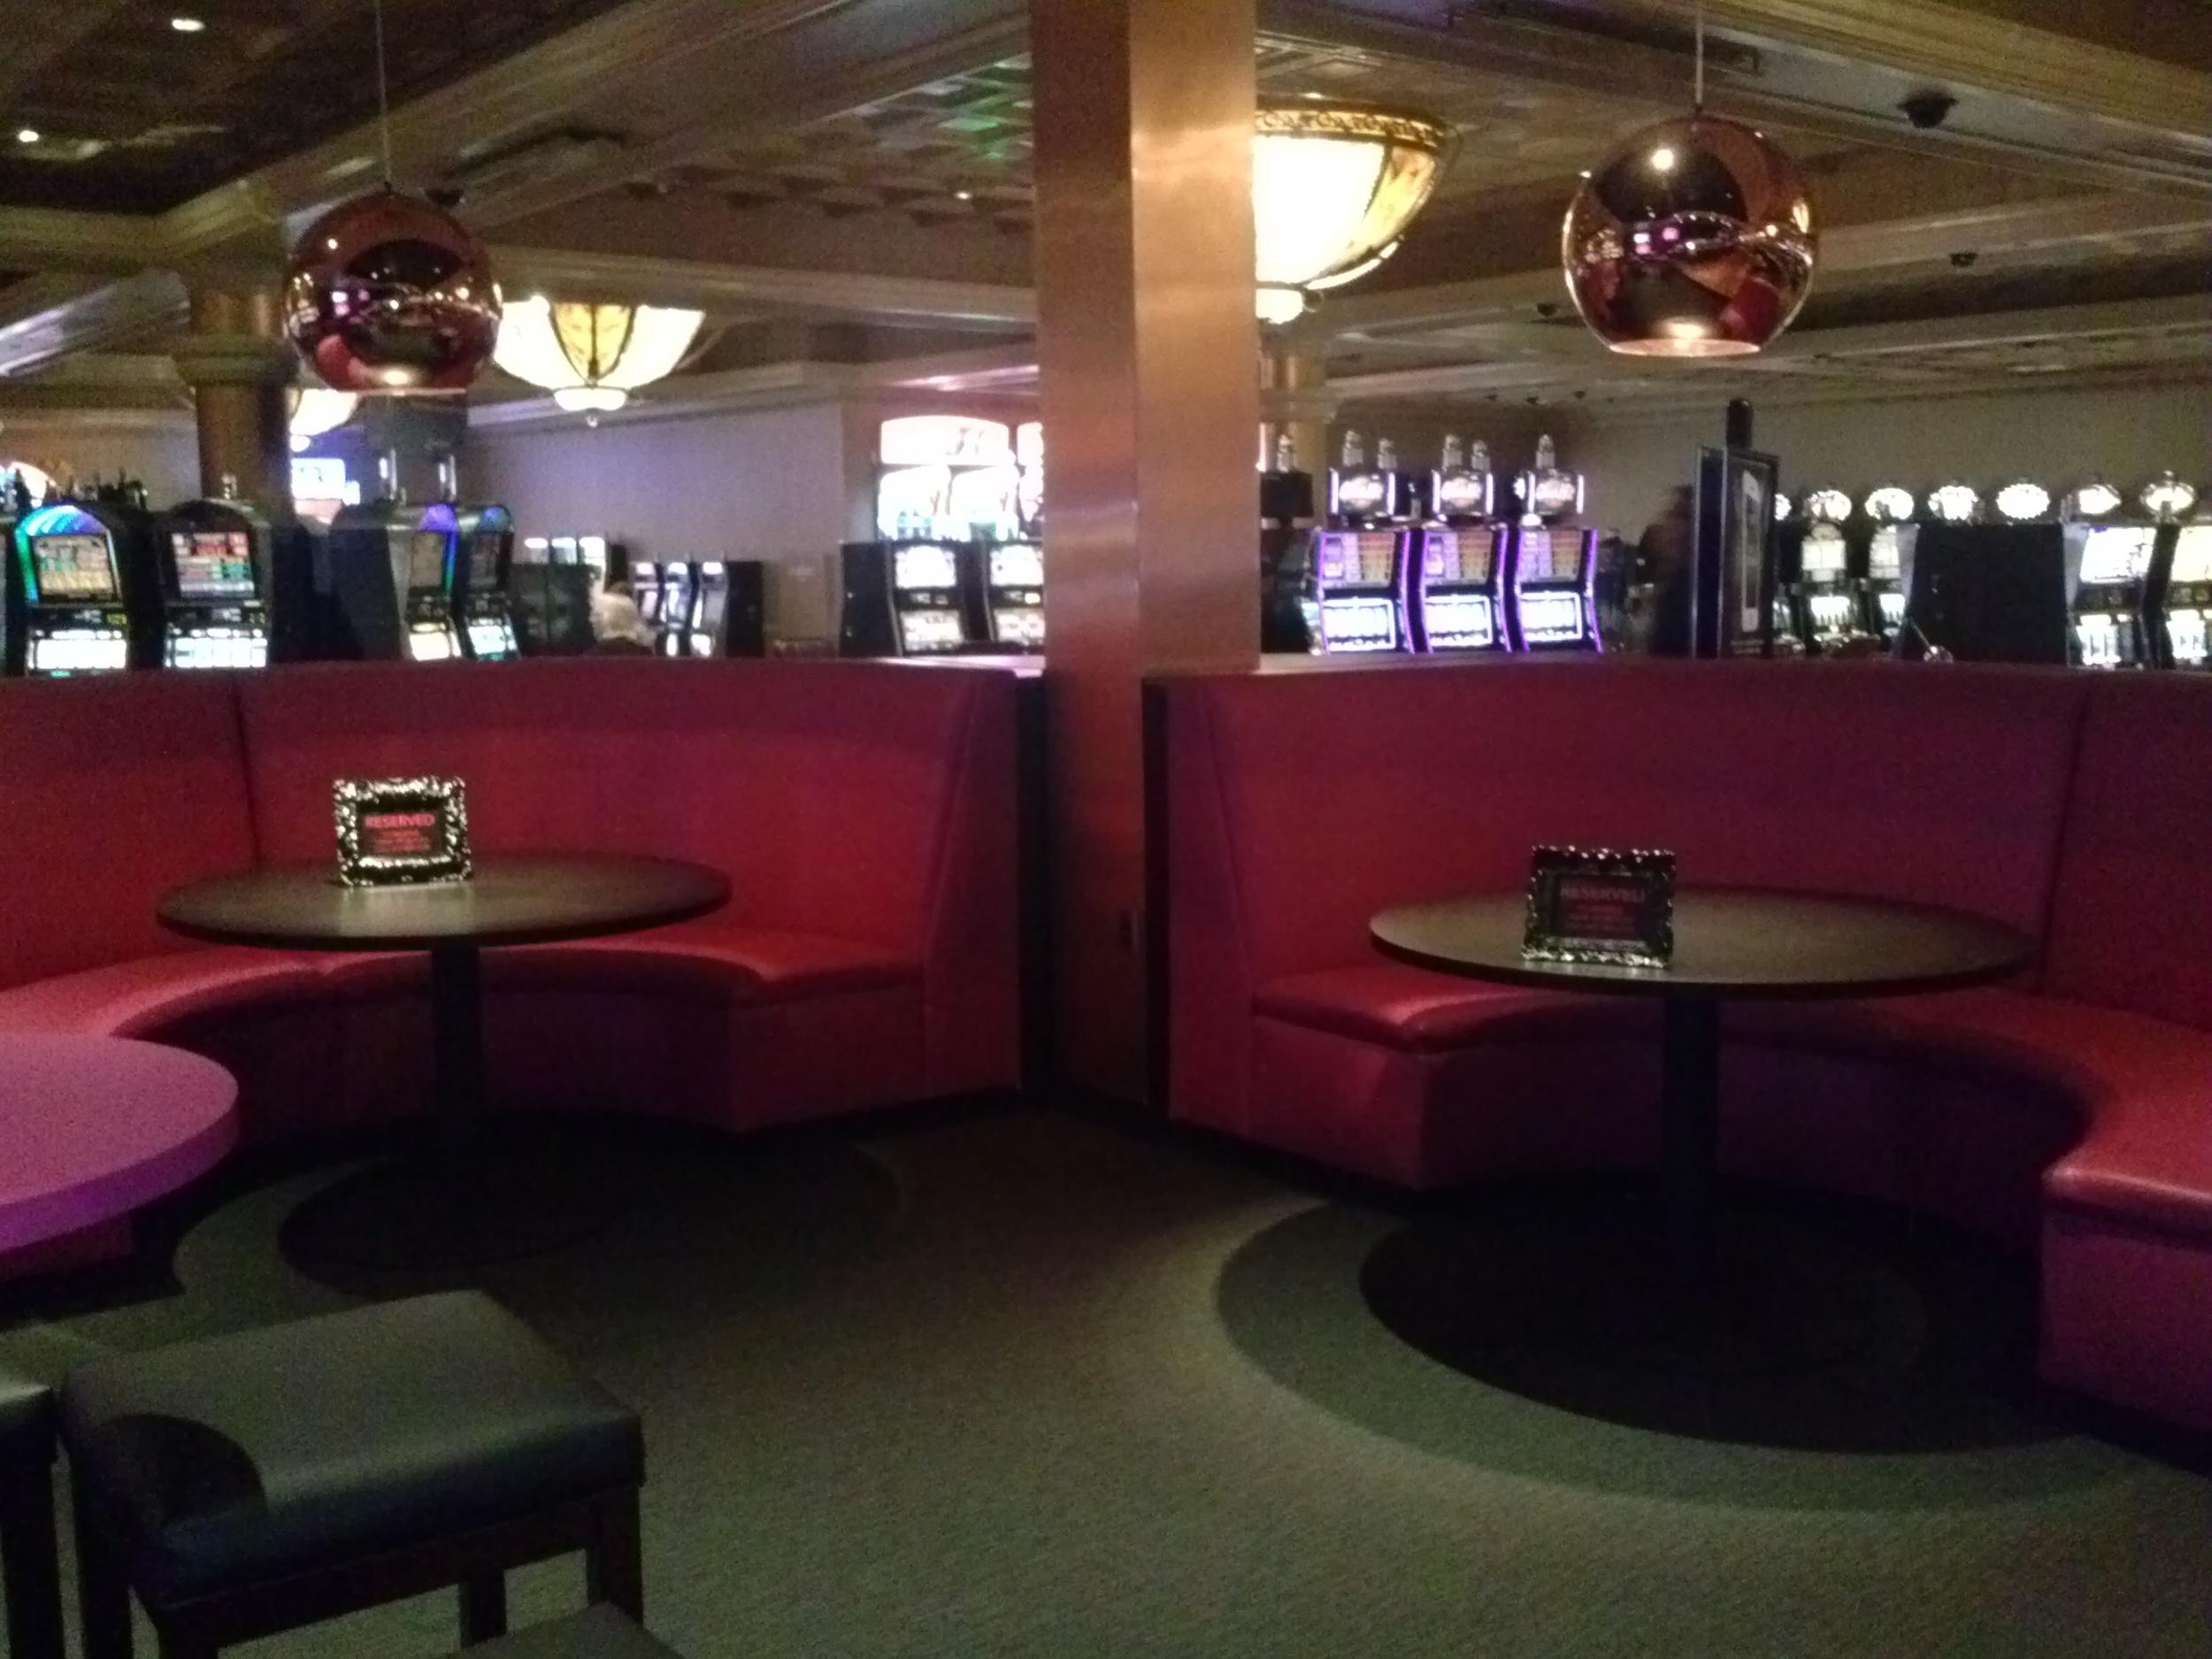 Envy Lounge @ Harrah's Horseshoe Southern Indiana